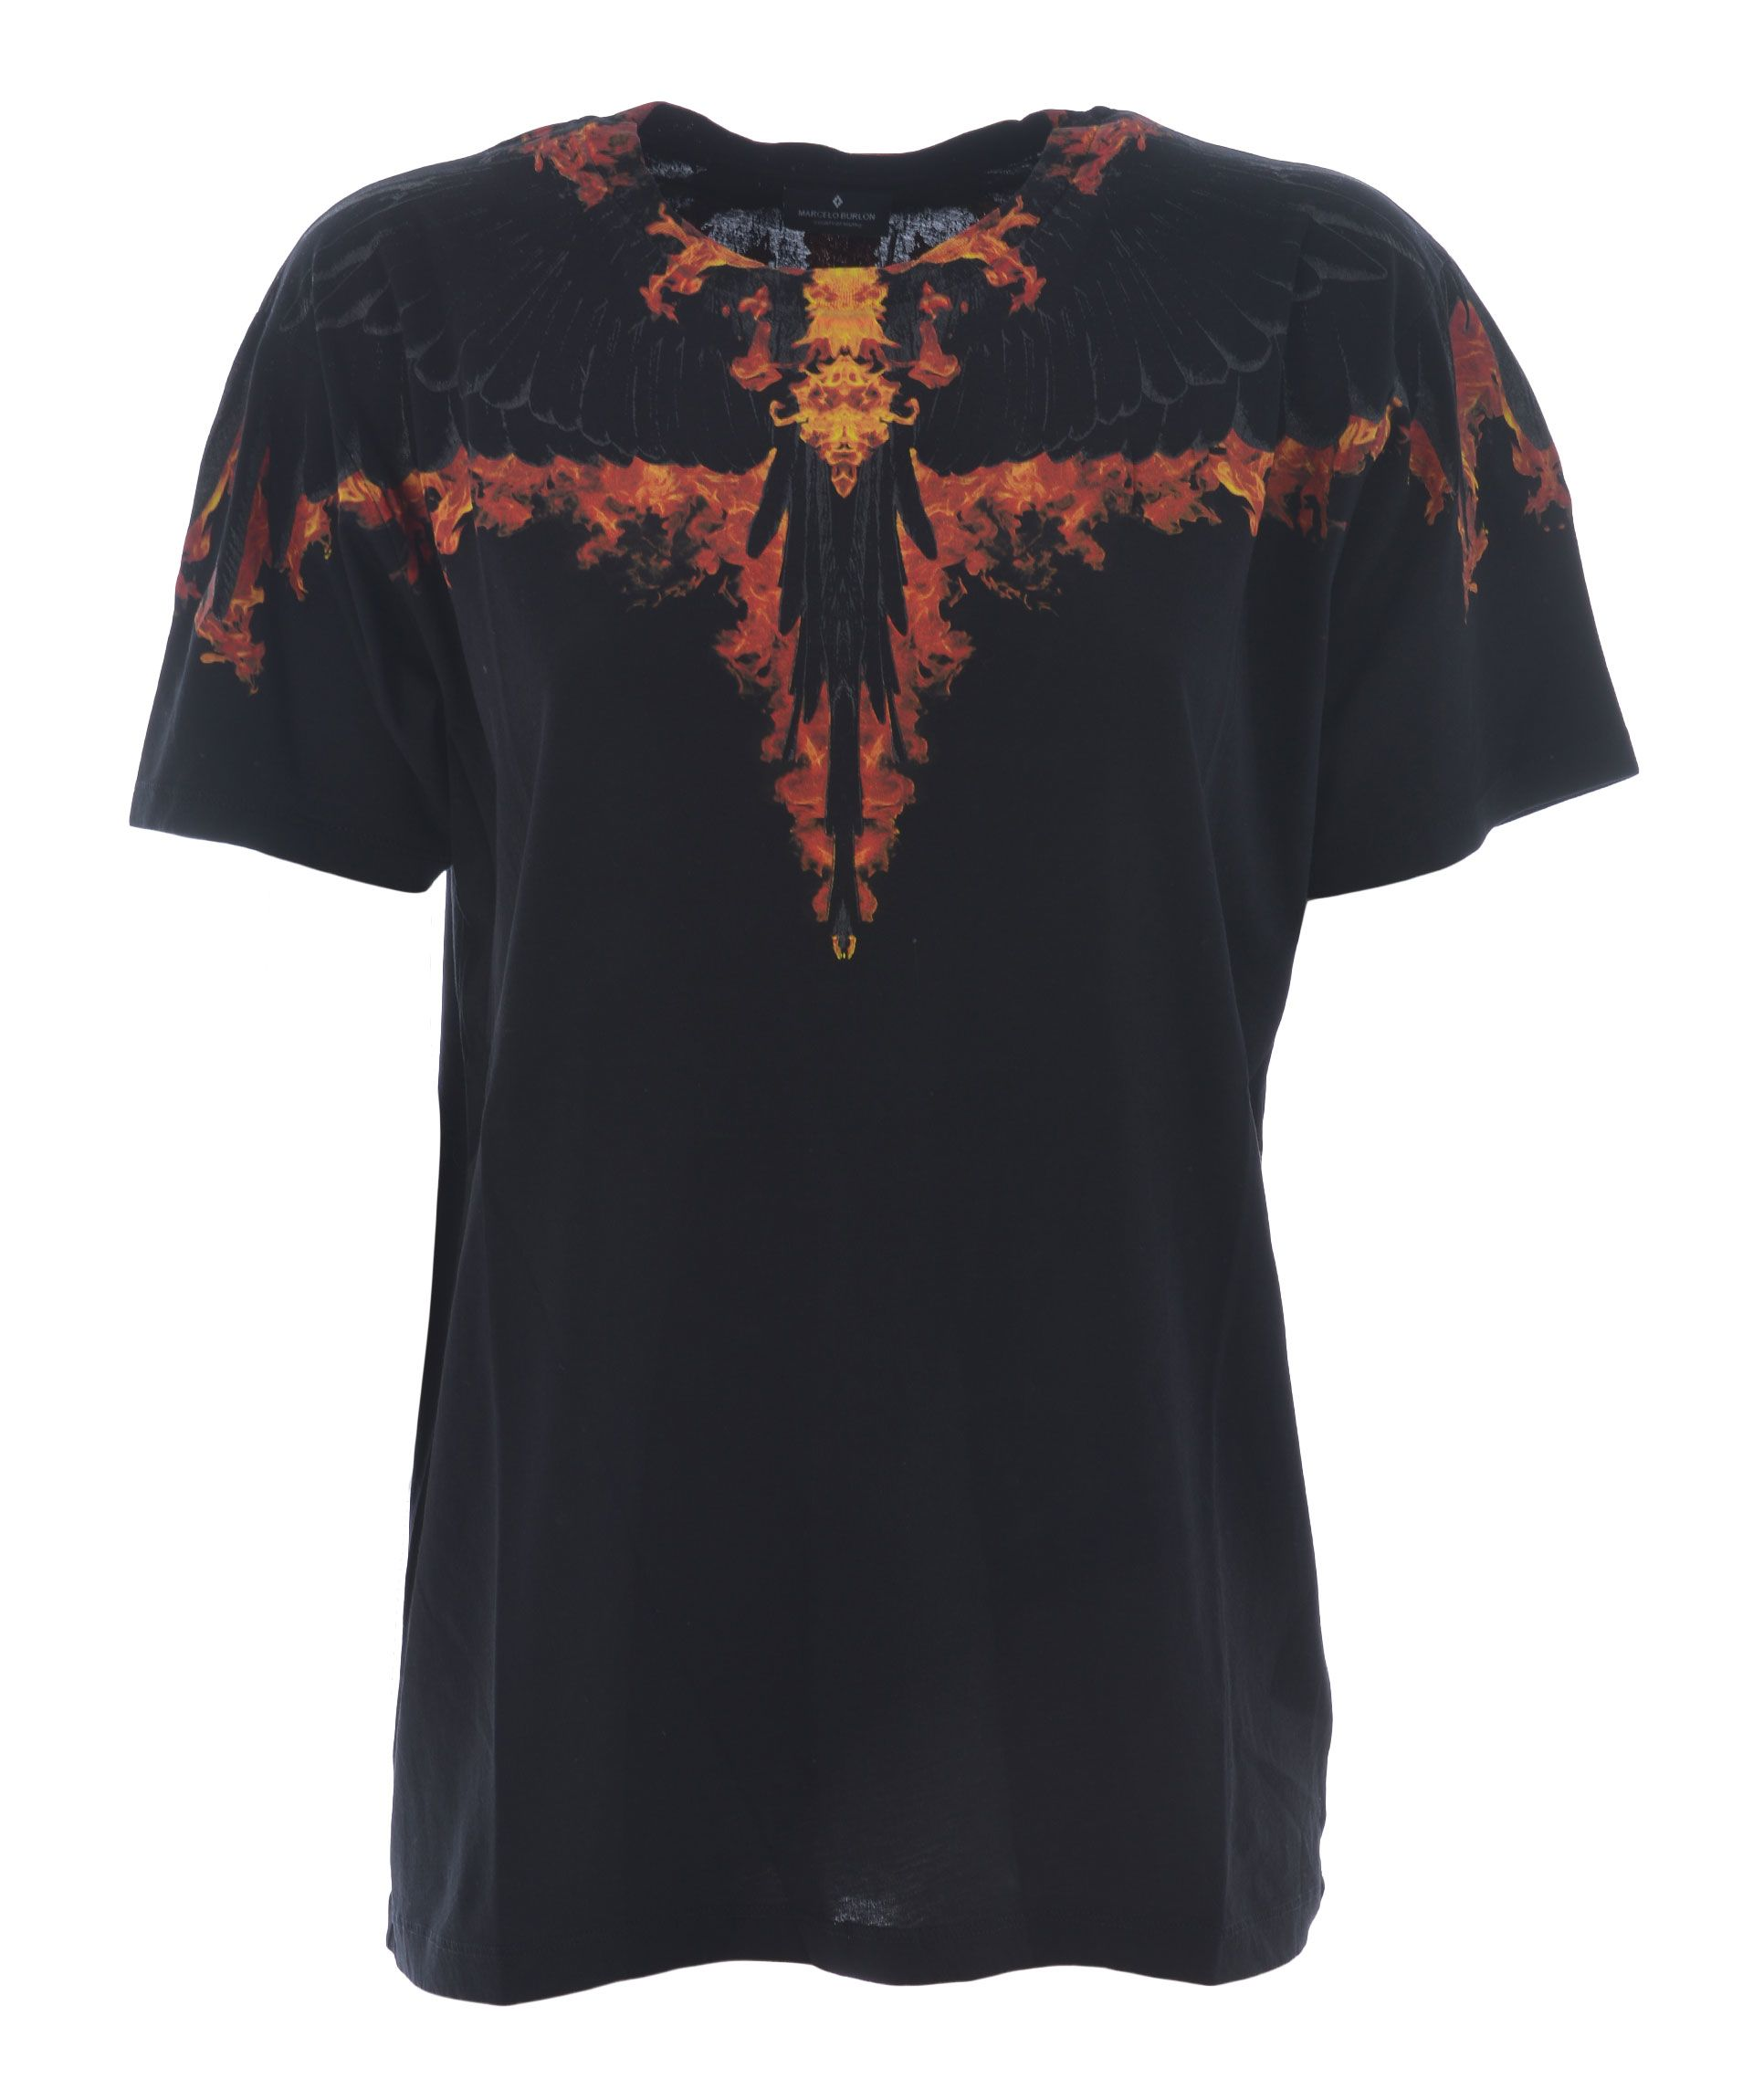 Marcelo Burlon Tokanki Fitted T-shirt